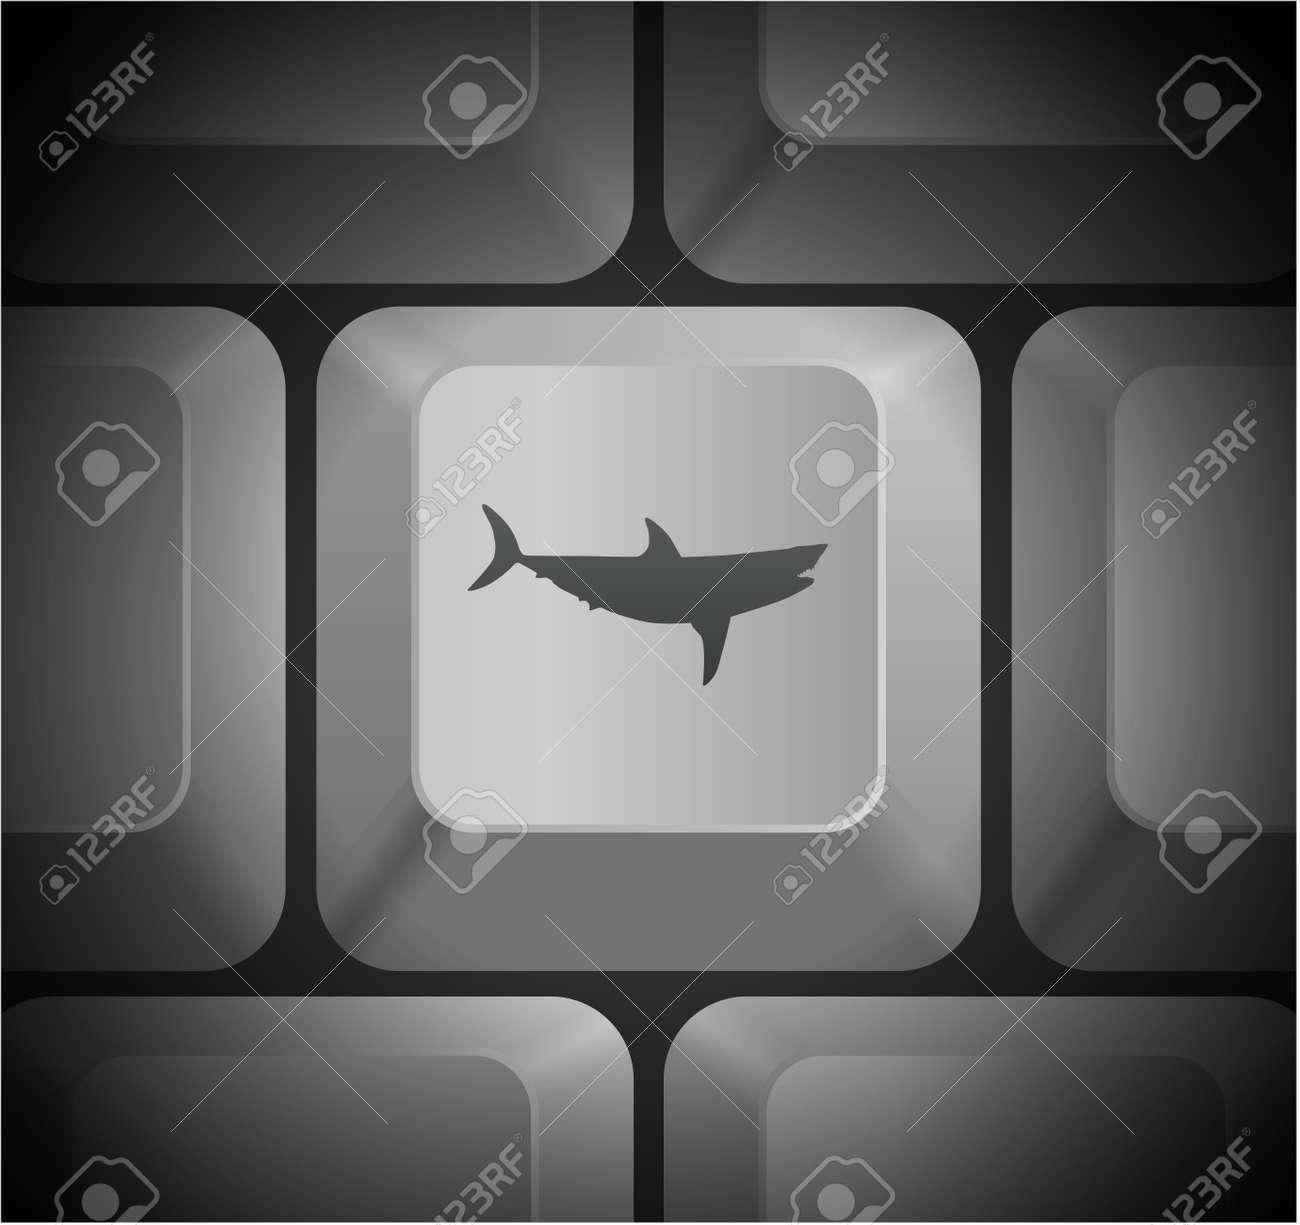 Shark Icon on Computer KeyboardOriginal Illustration